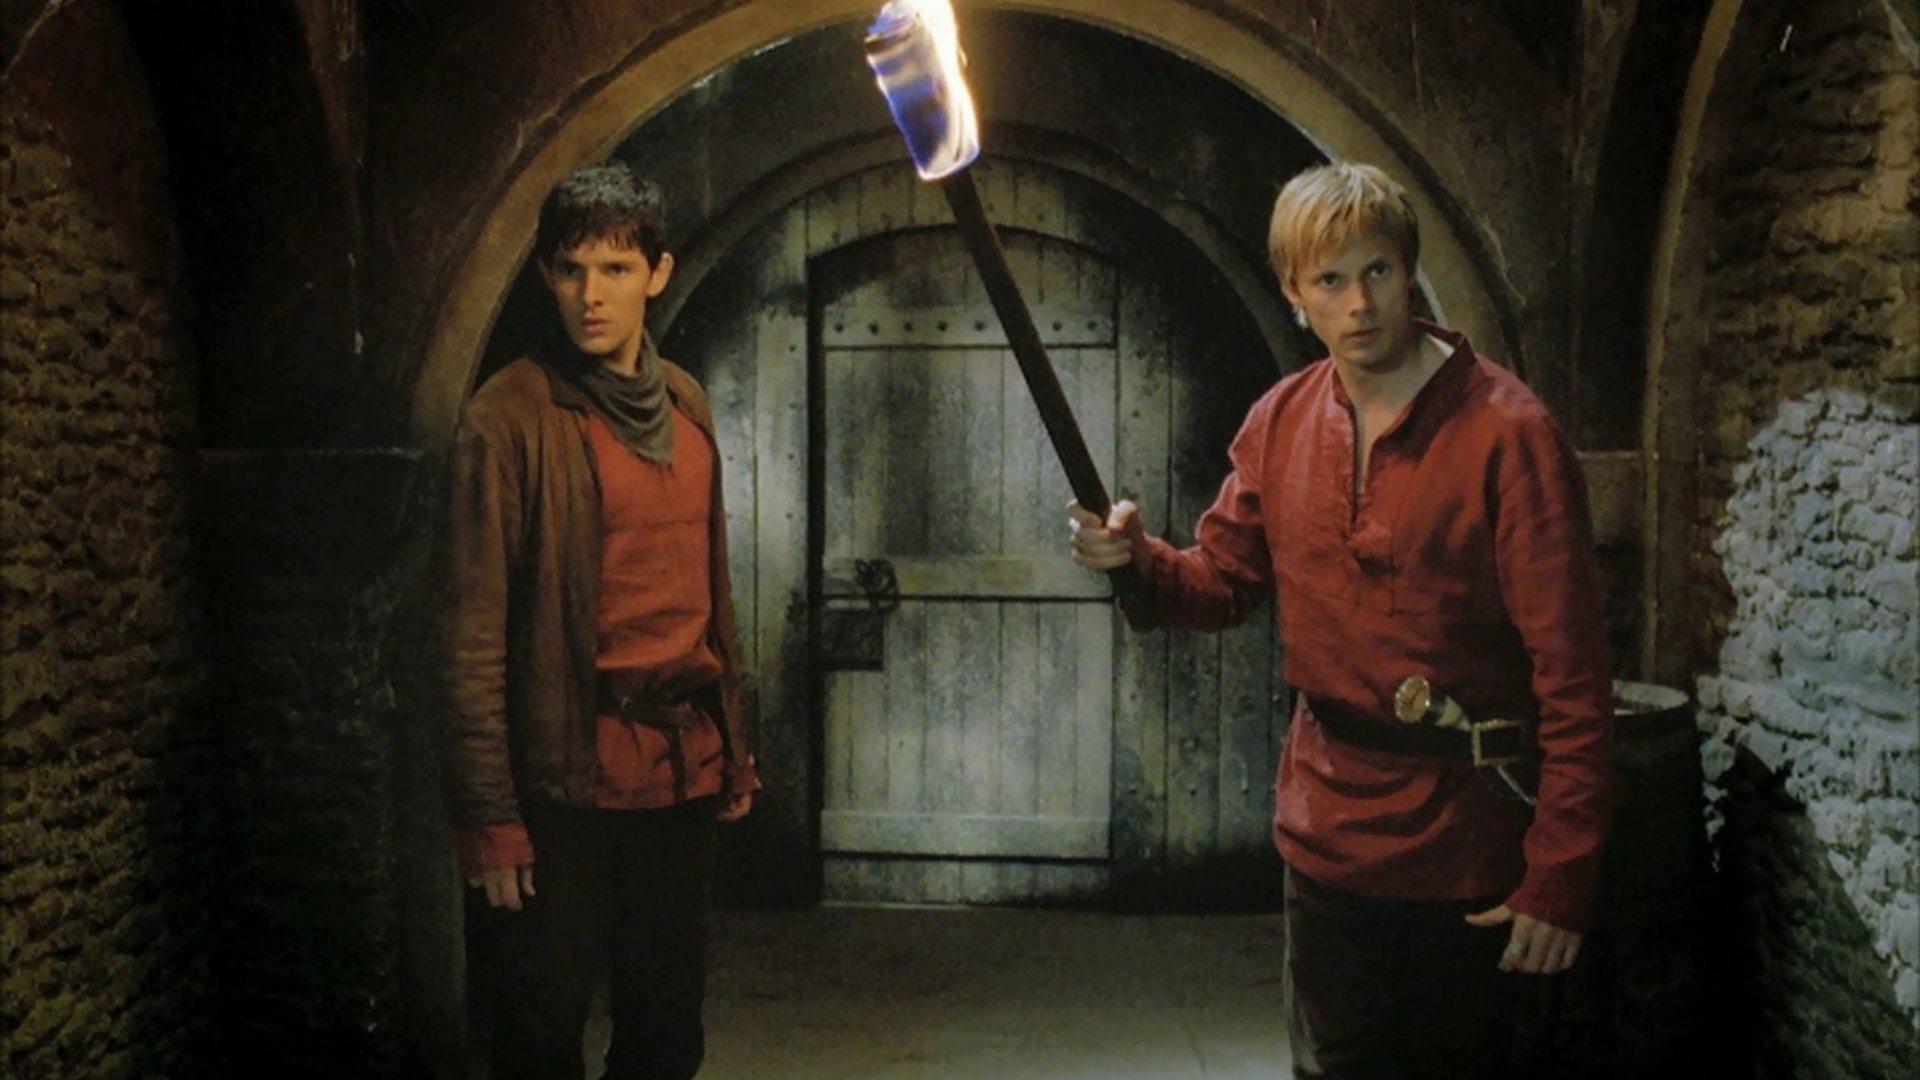 Merlin season 1 episode 7 2008 - Merlin Season 1 Episode 7 2008 53